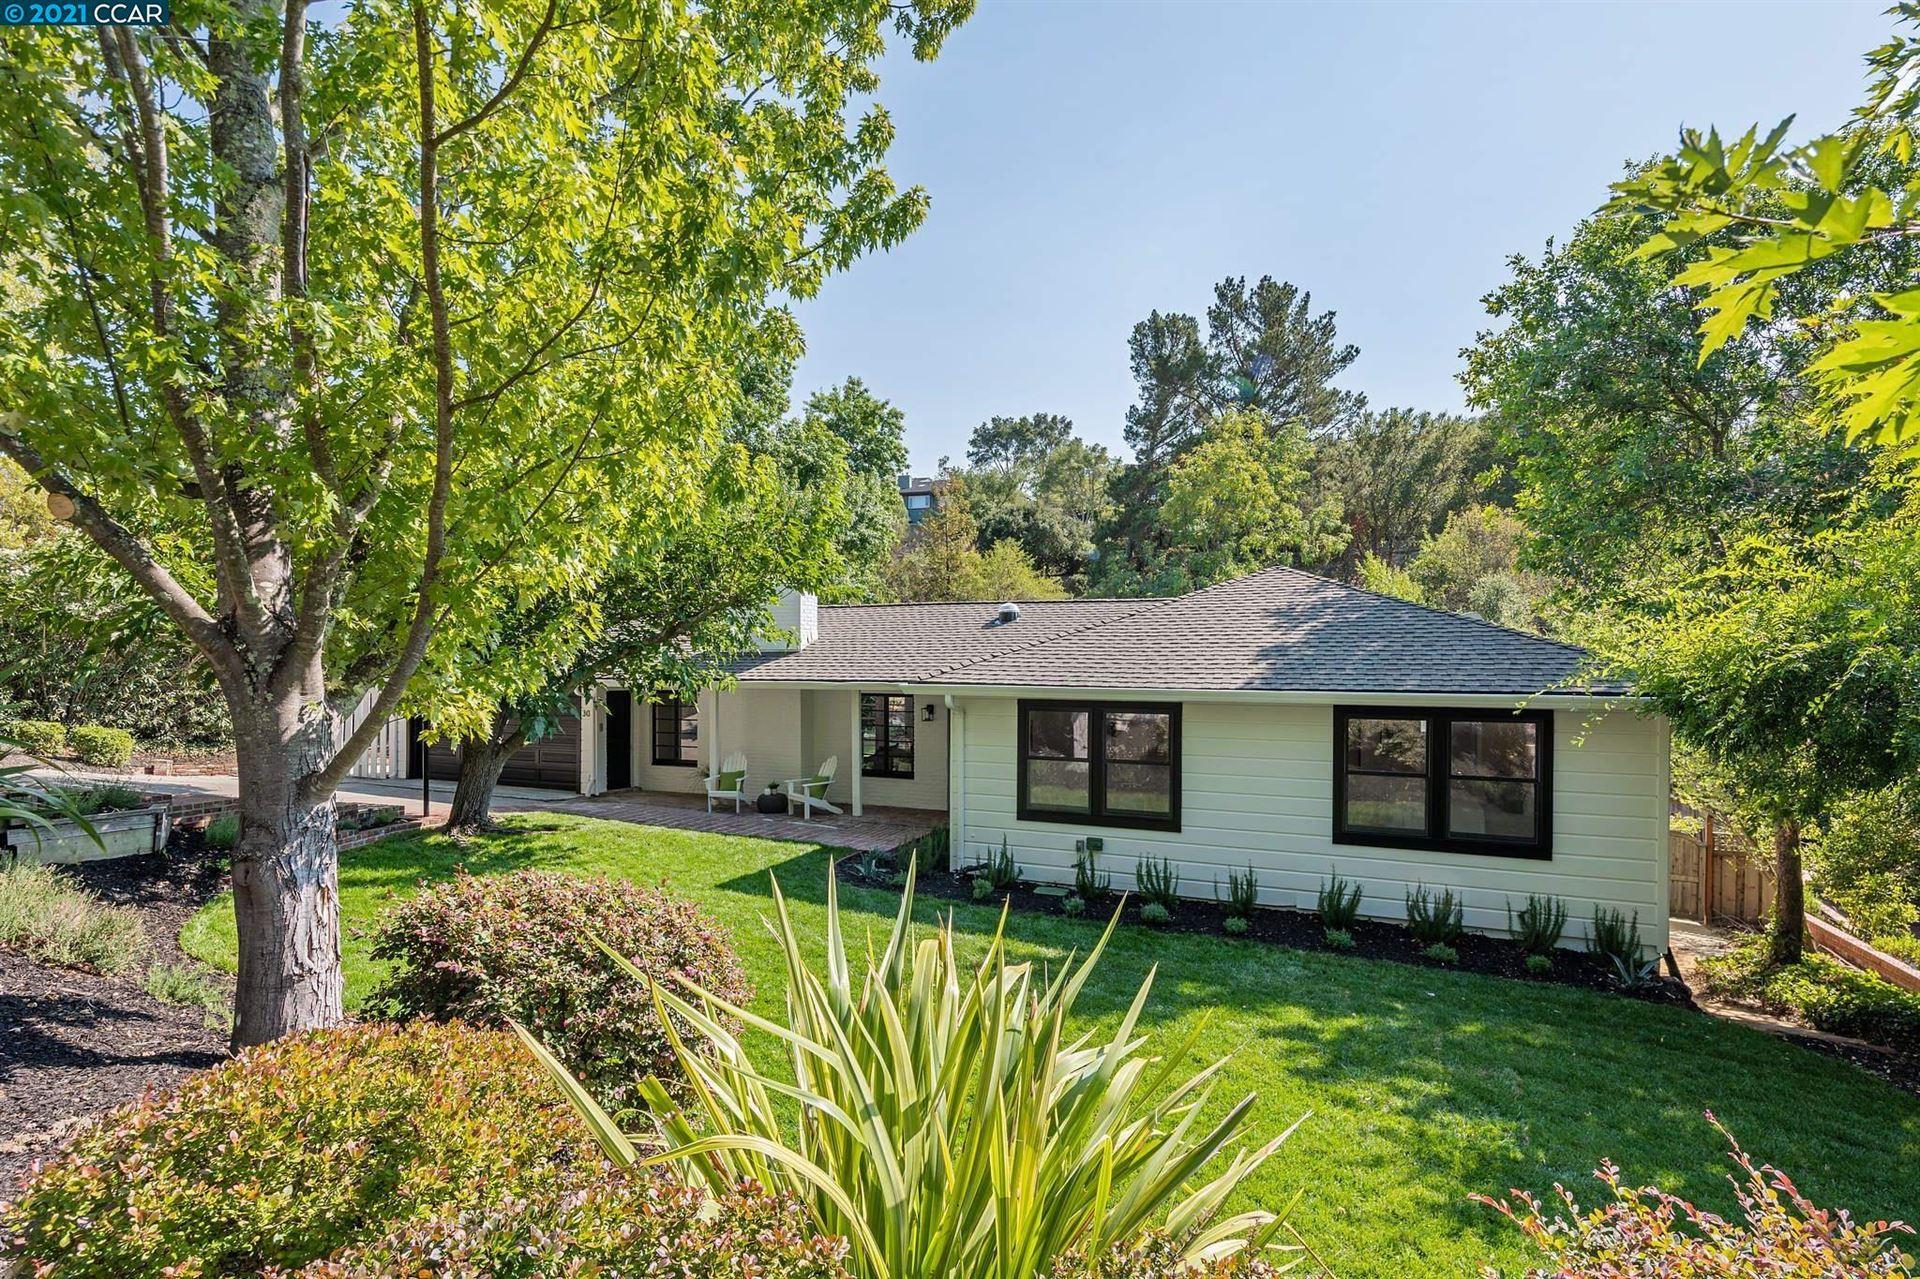 Photo of 30 Meadow Park Ct., ORINDA, CA 94563-3245 (MLS # 40966036)